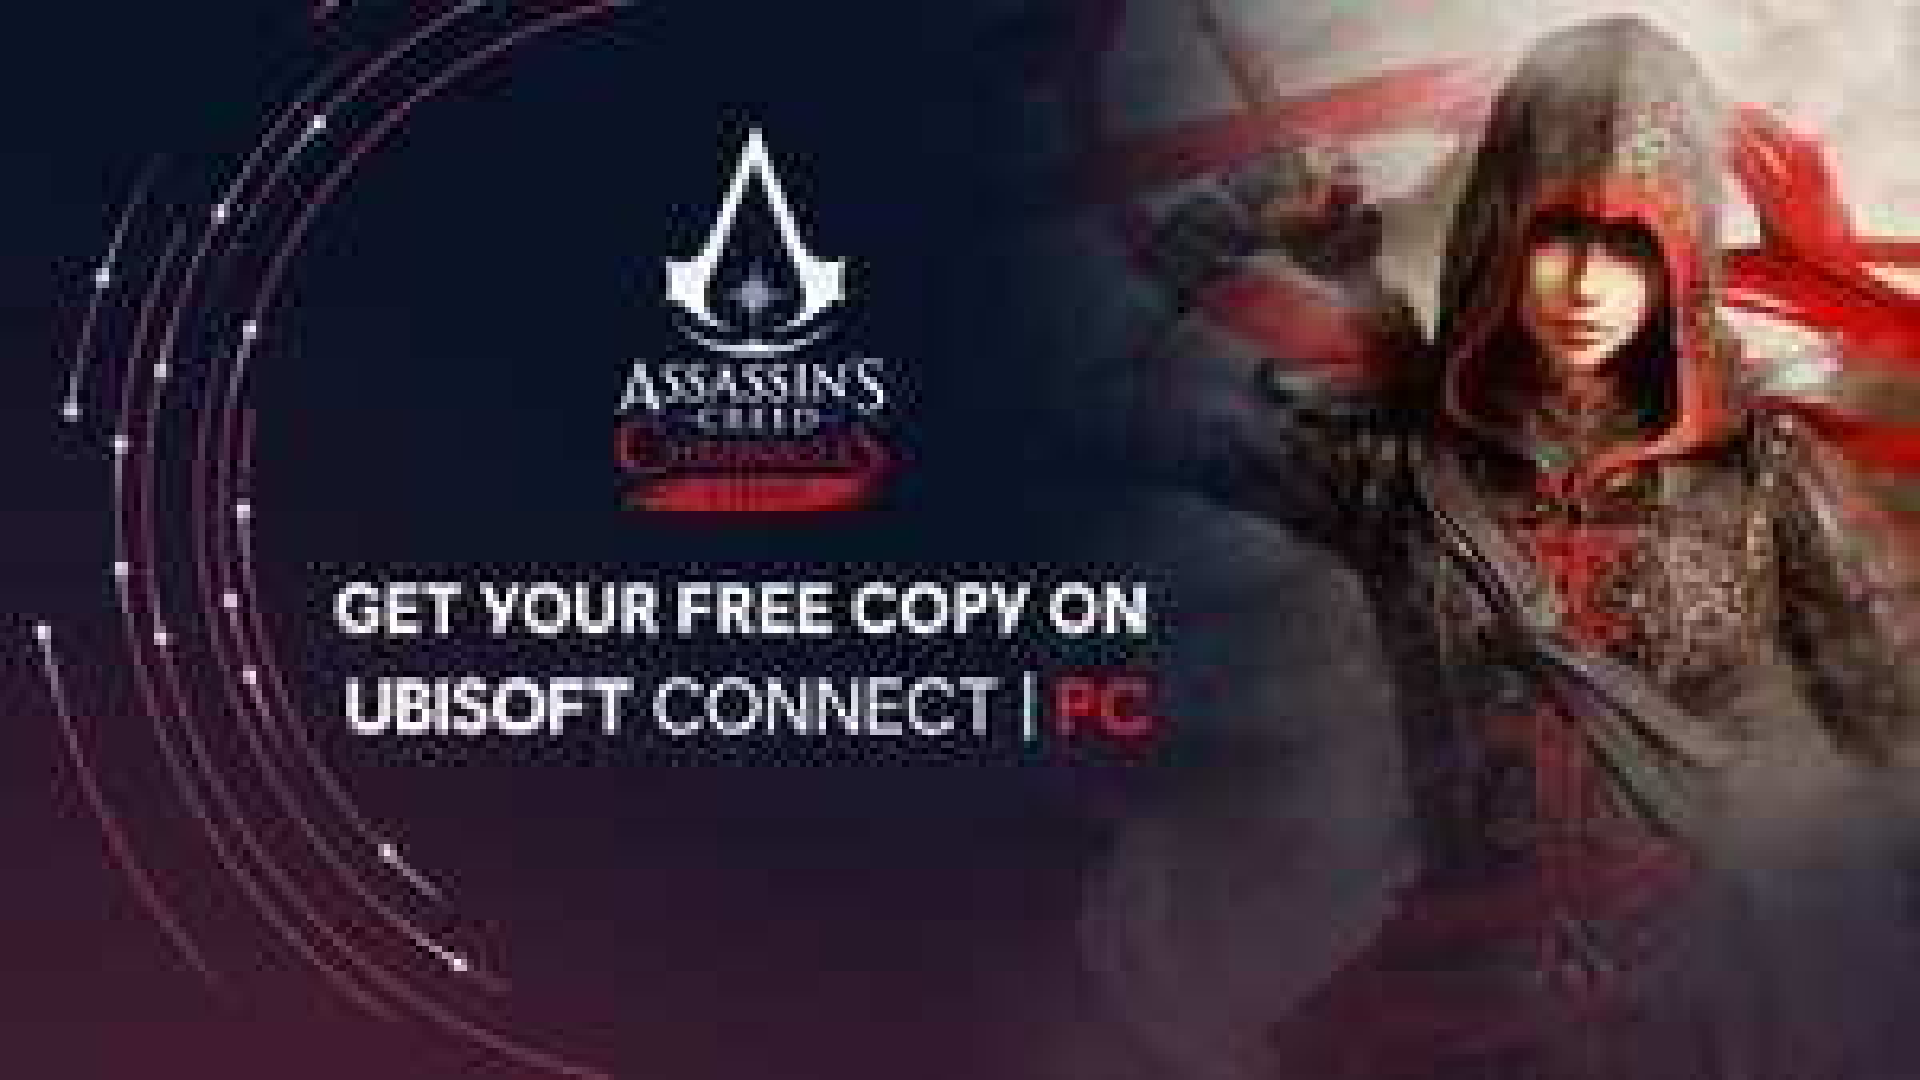 [GRATIS] Assassins Creed Chronicles China (PC)